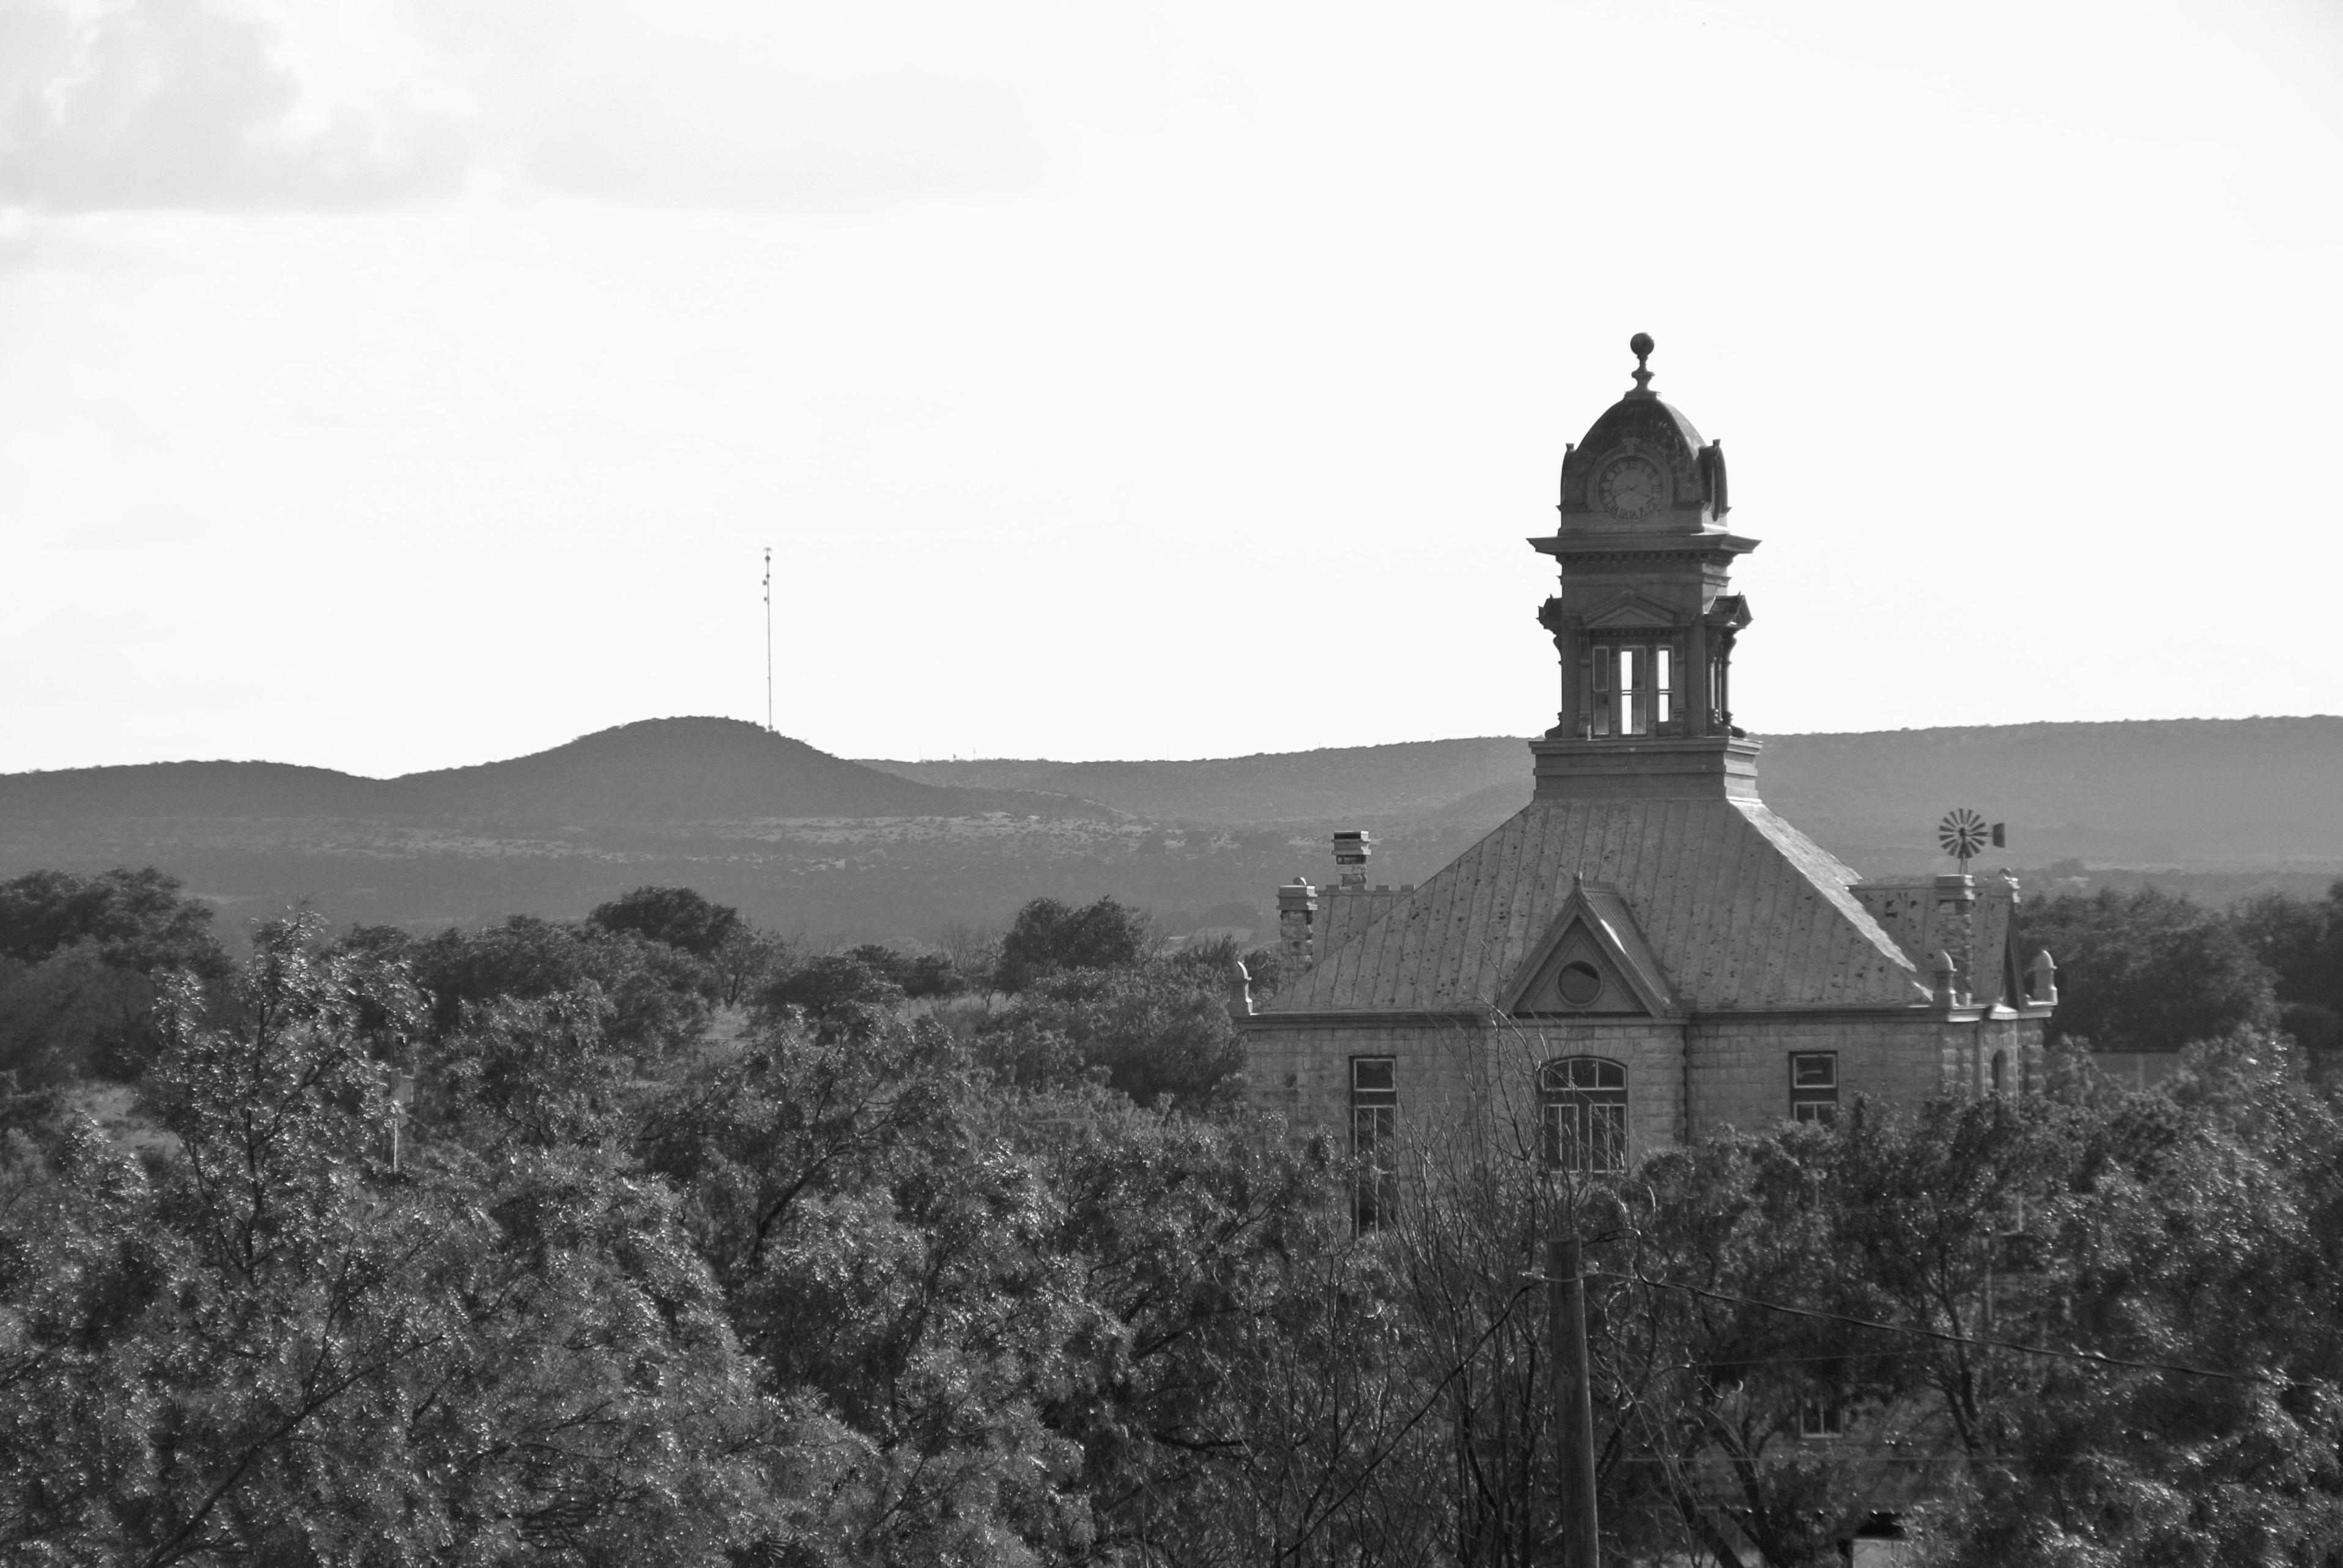 Irion County Courthouse Sherwood Texas